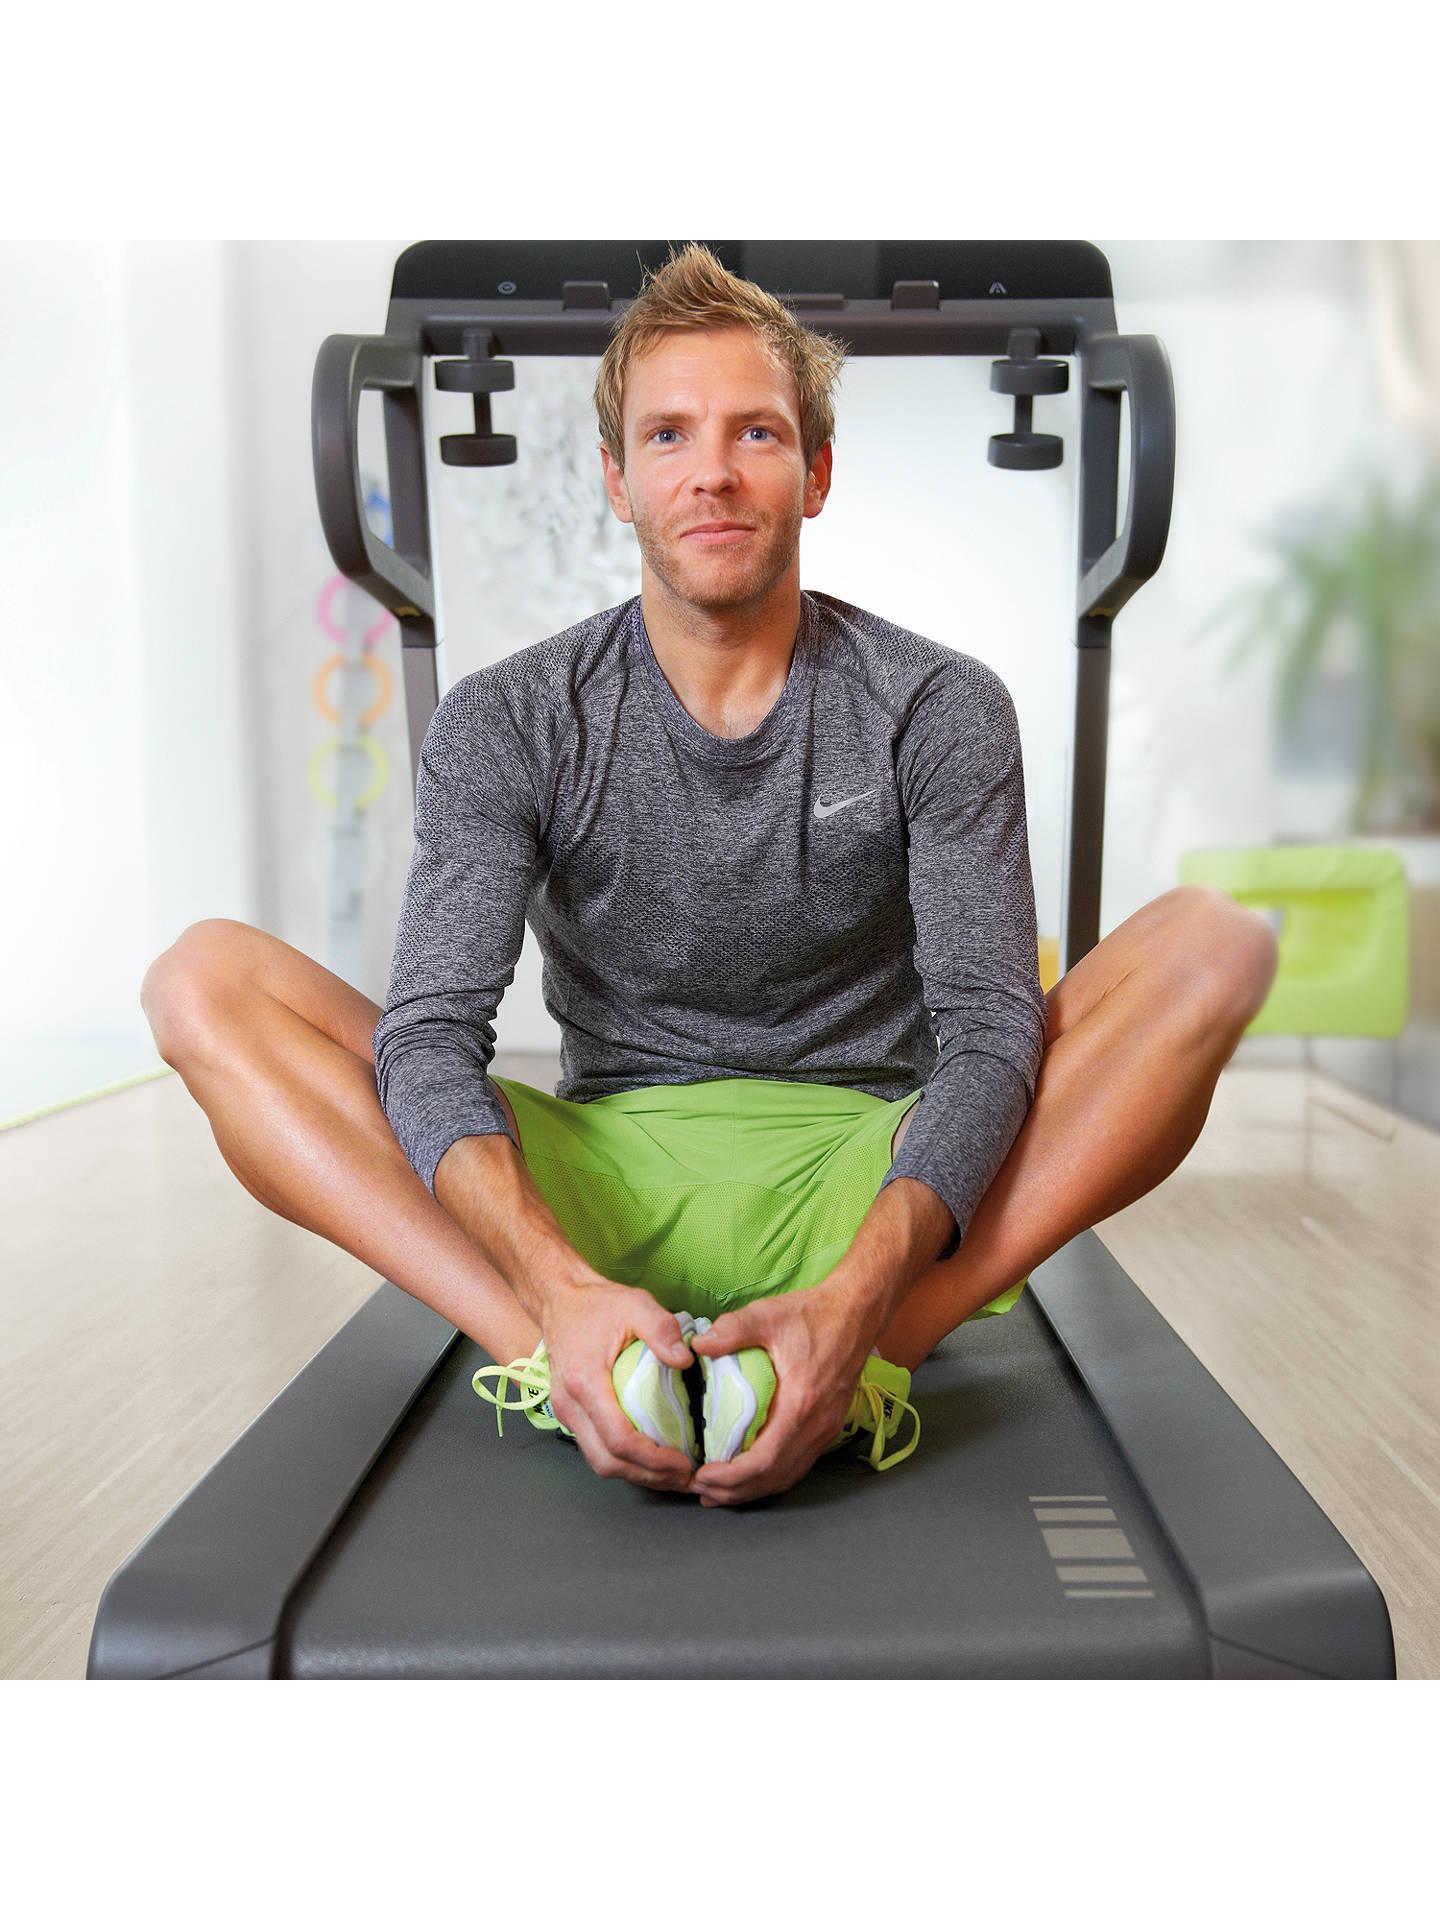 Myrun technogym treadmill cosmo black at john lewis